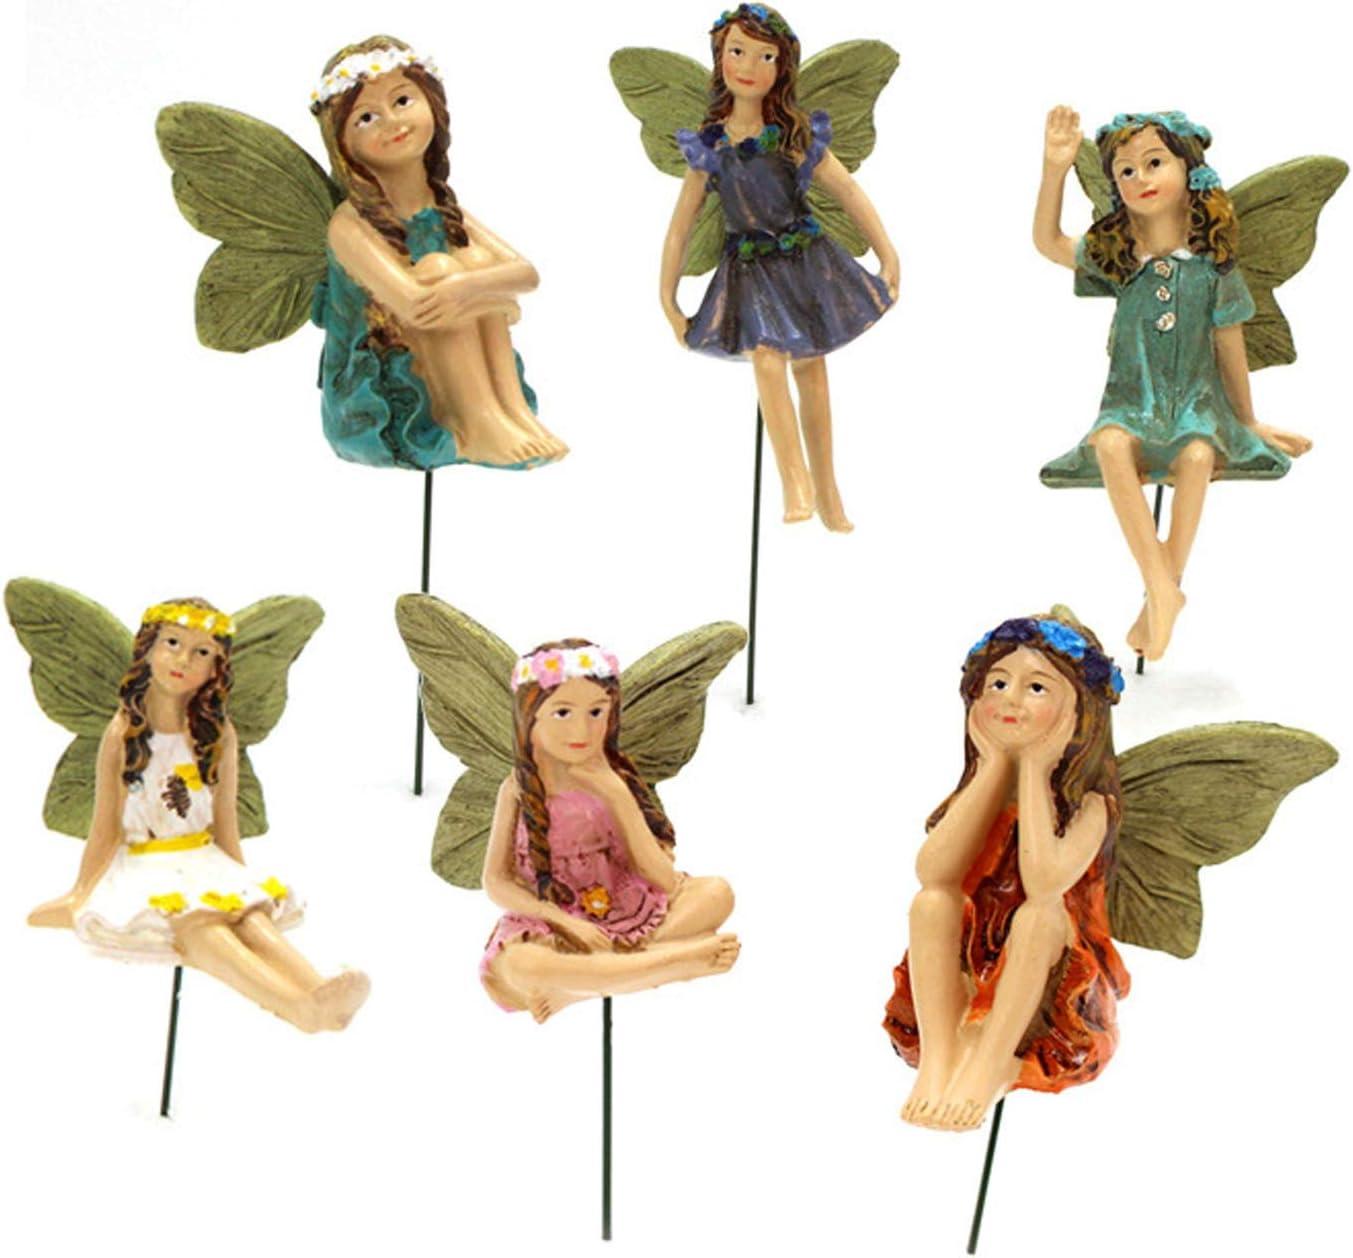 YIlanglang Miniature Fairy 6 Pack Fairy Garden Accessories Mini Garden Fairy Figurines Little Girls Poted Plants Ornaments Micro Landscape Home Garden Lawn Decoration Garden Bonsai Craft Decor